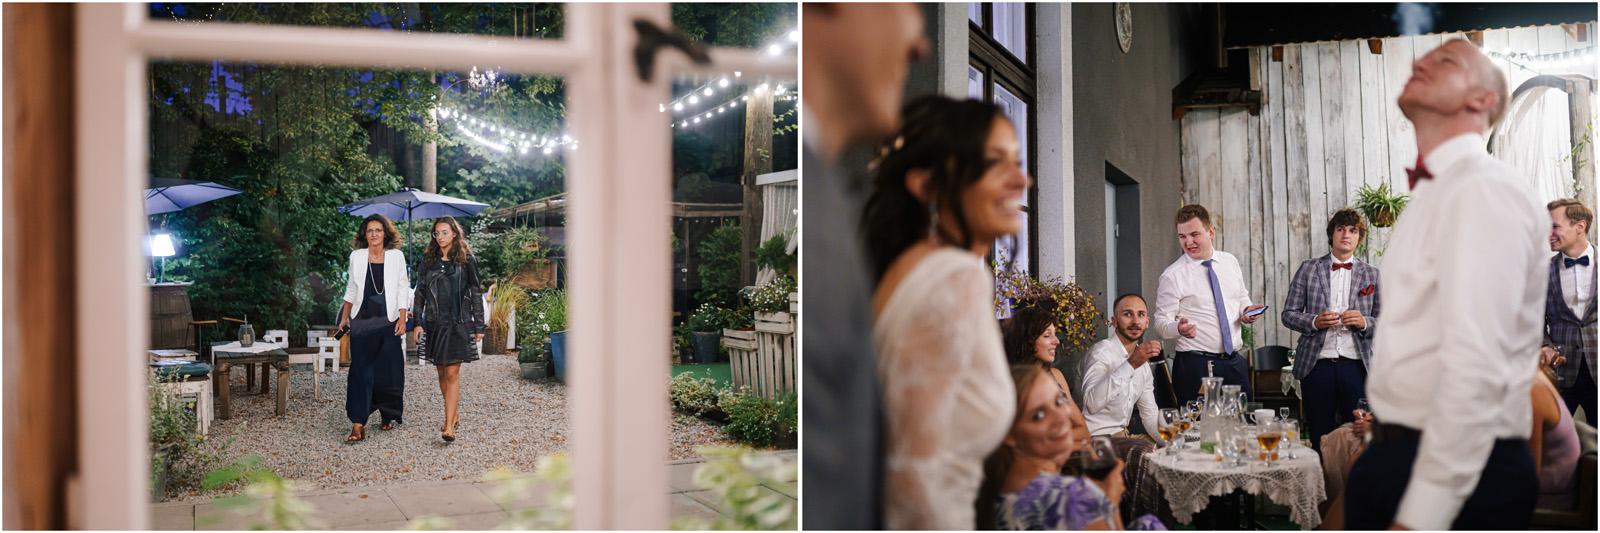 Ania & Mateusz | boho wesele w Stodole pod Kasztanami 130